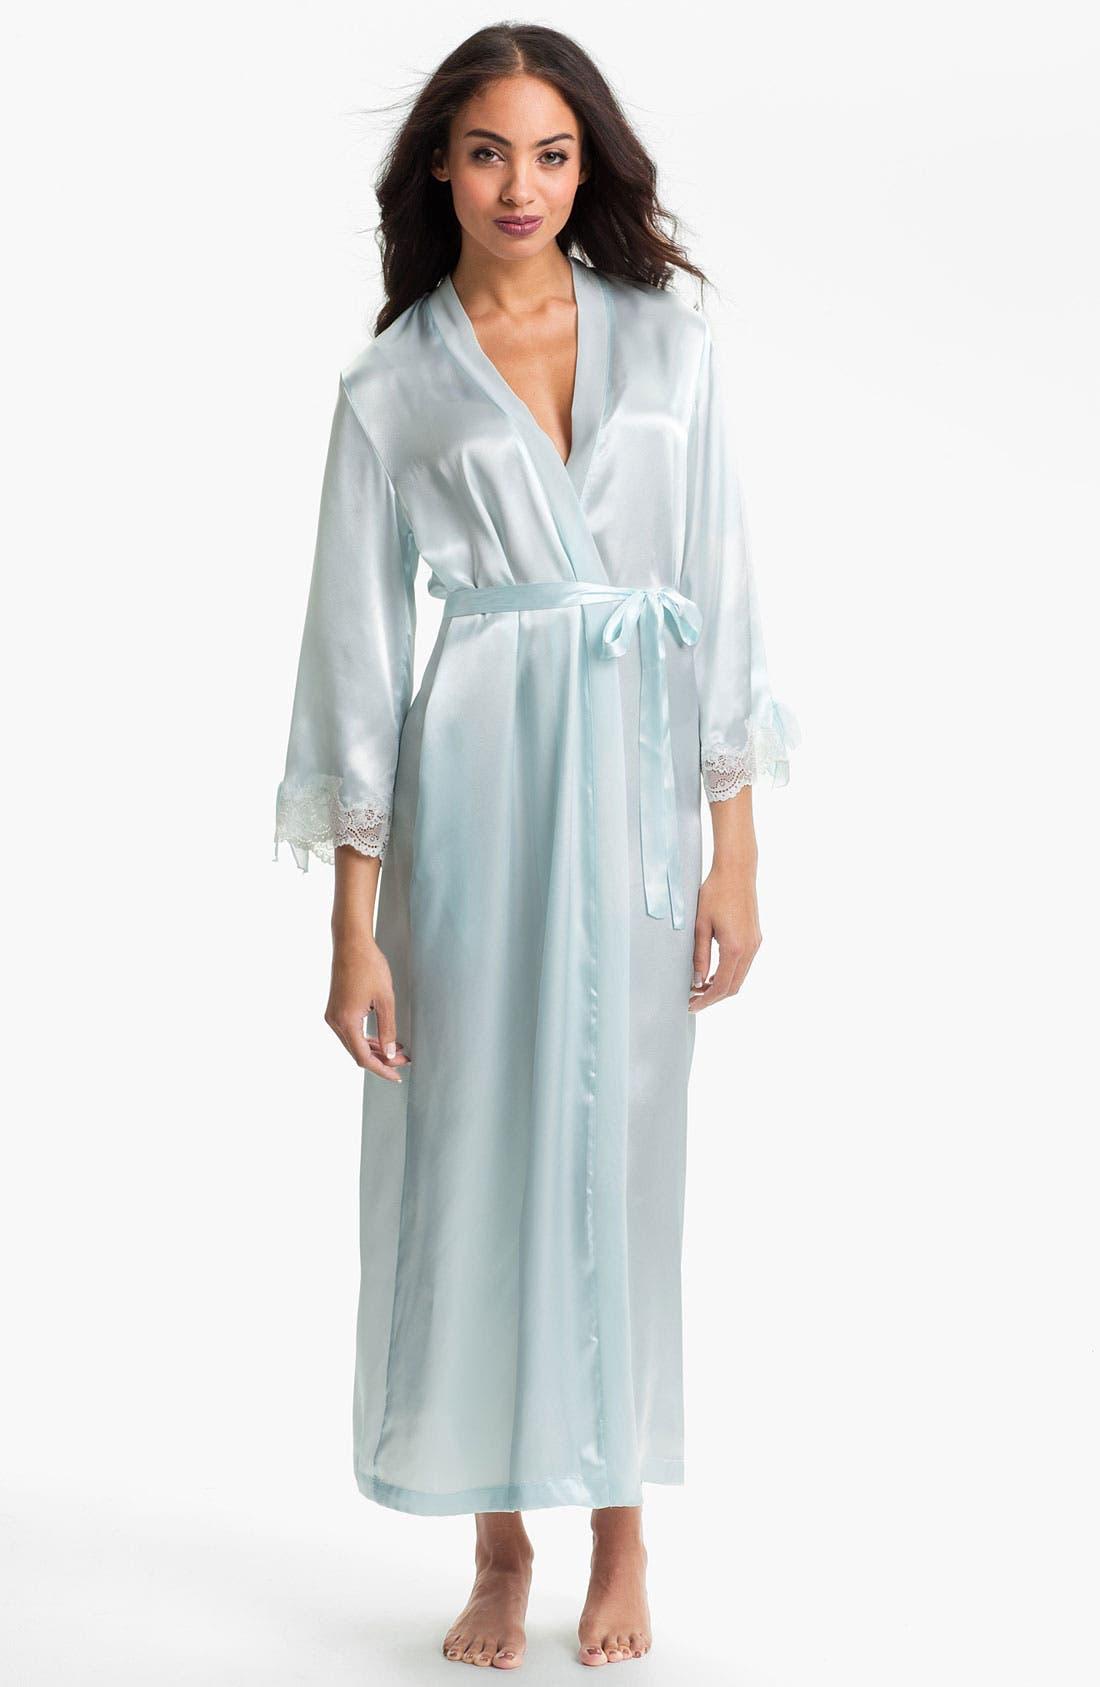 Alternate Image 1 Selected - Oscar de la Renta Sleepwear Lace Trim Charmeuse Robe